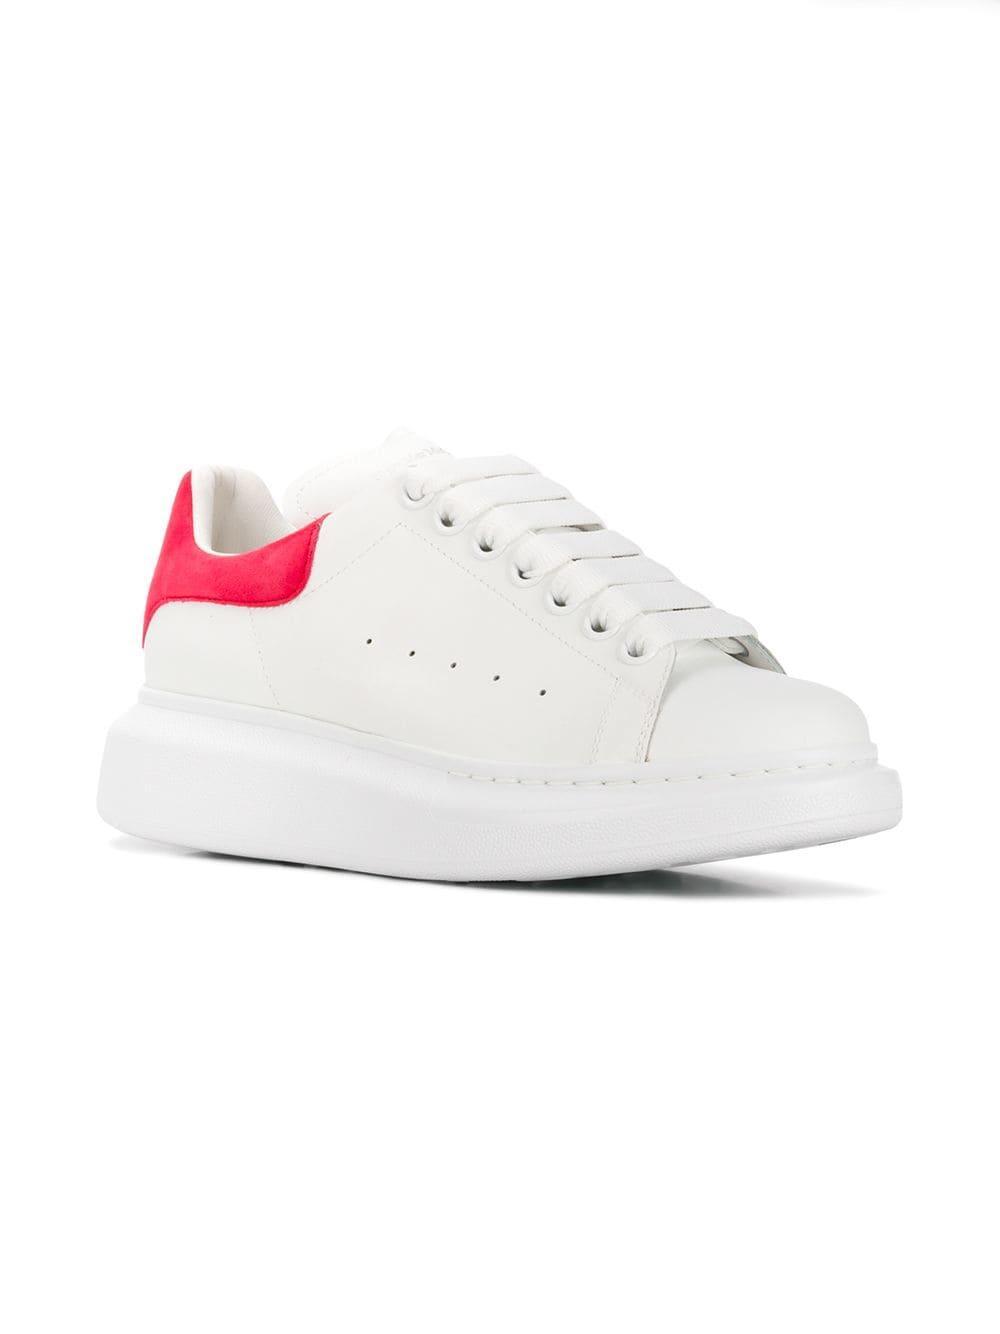 38201ea080d9 Alexander McQueen - White Oversized Sole Sneakers - Lyst. View fullscreen